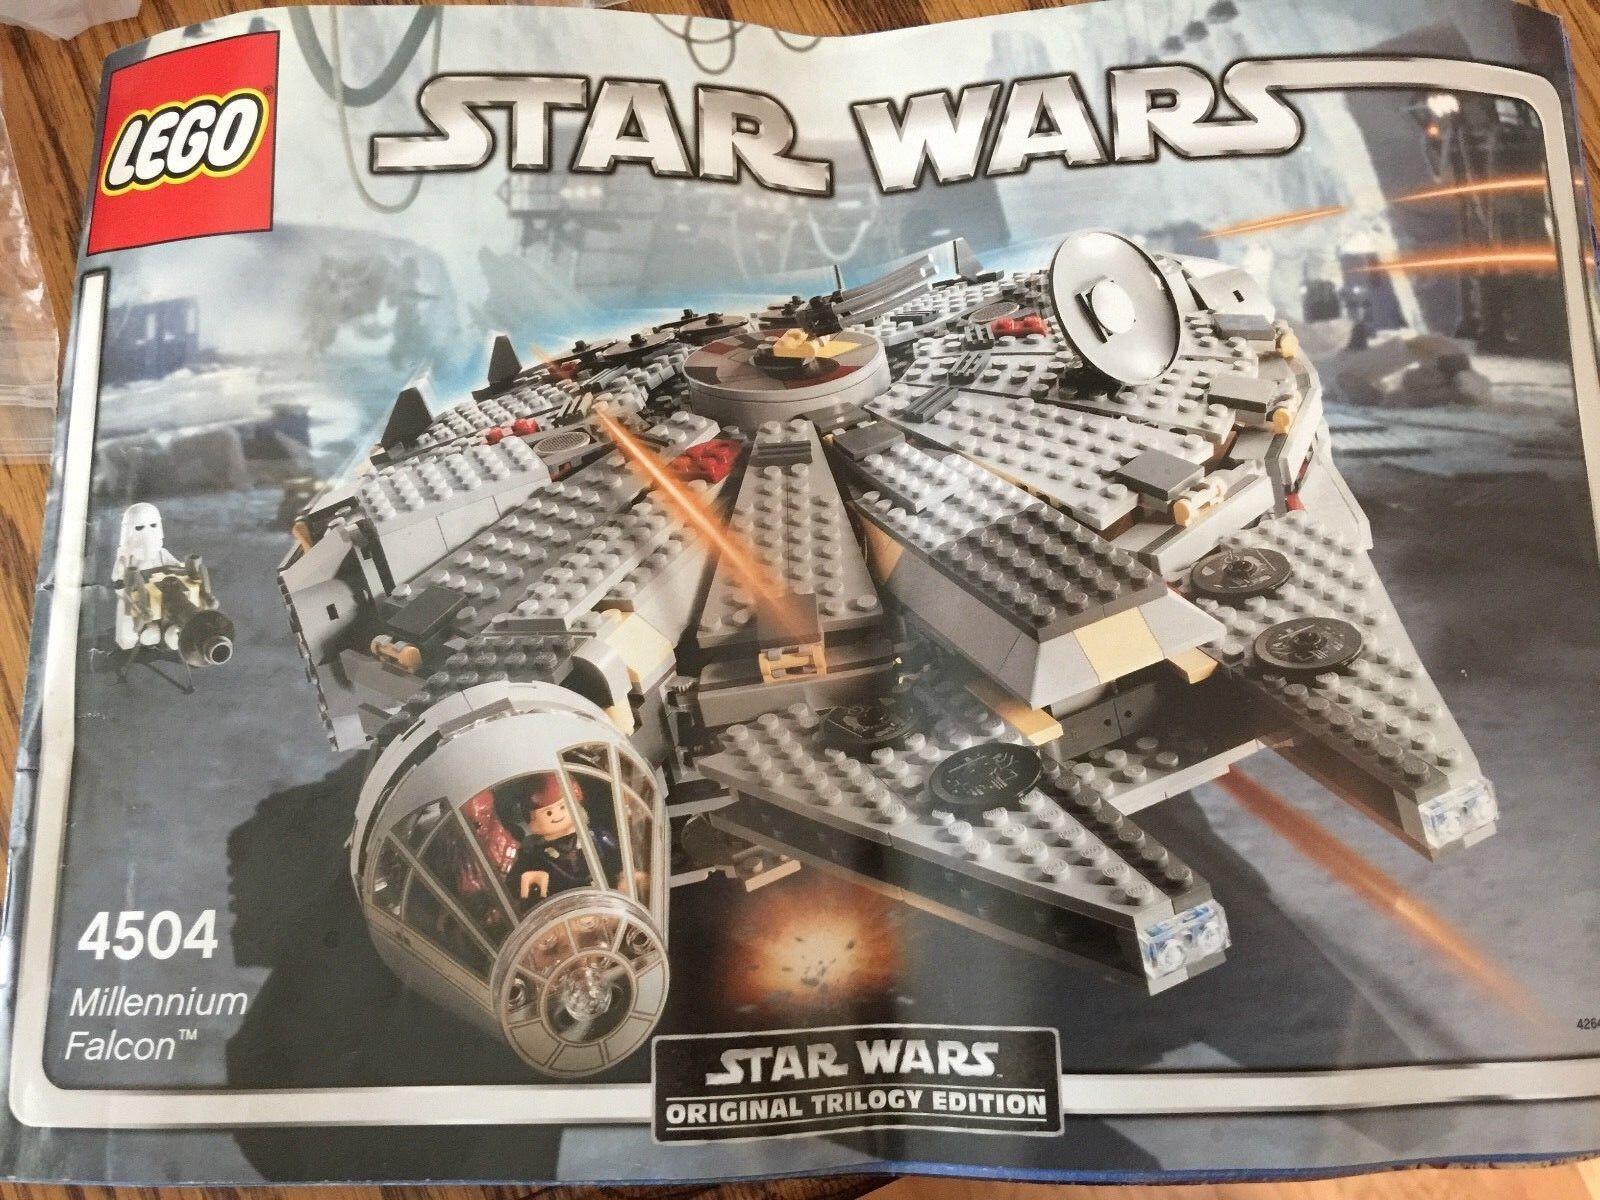 LEGO 4504 Star Wars Wars Wars Millennium Falcon Original Trilogy Set 985 Pieces fe22a1